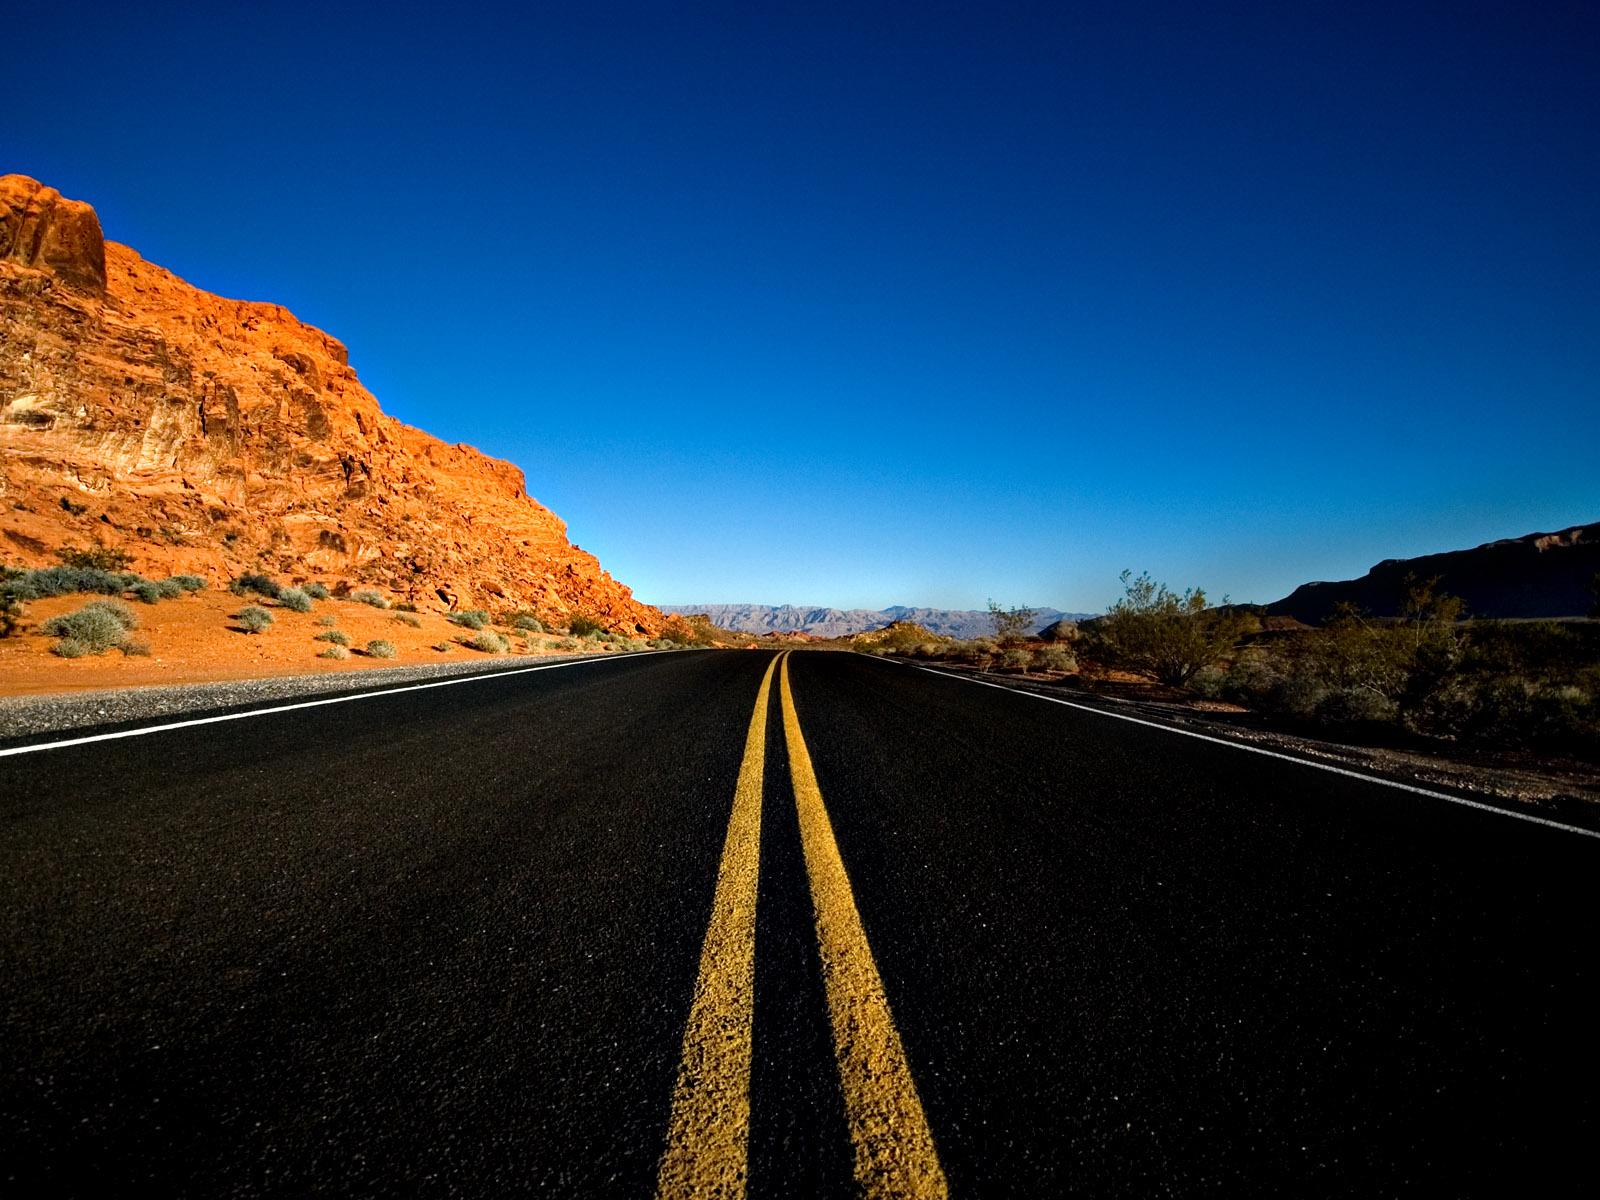 My Background Blog roadway